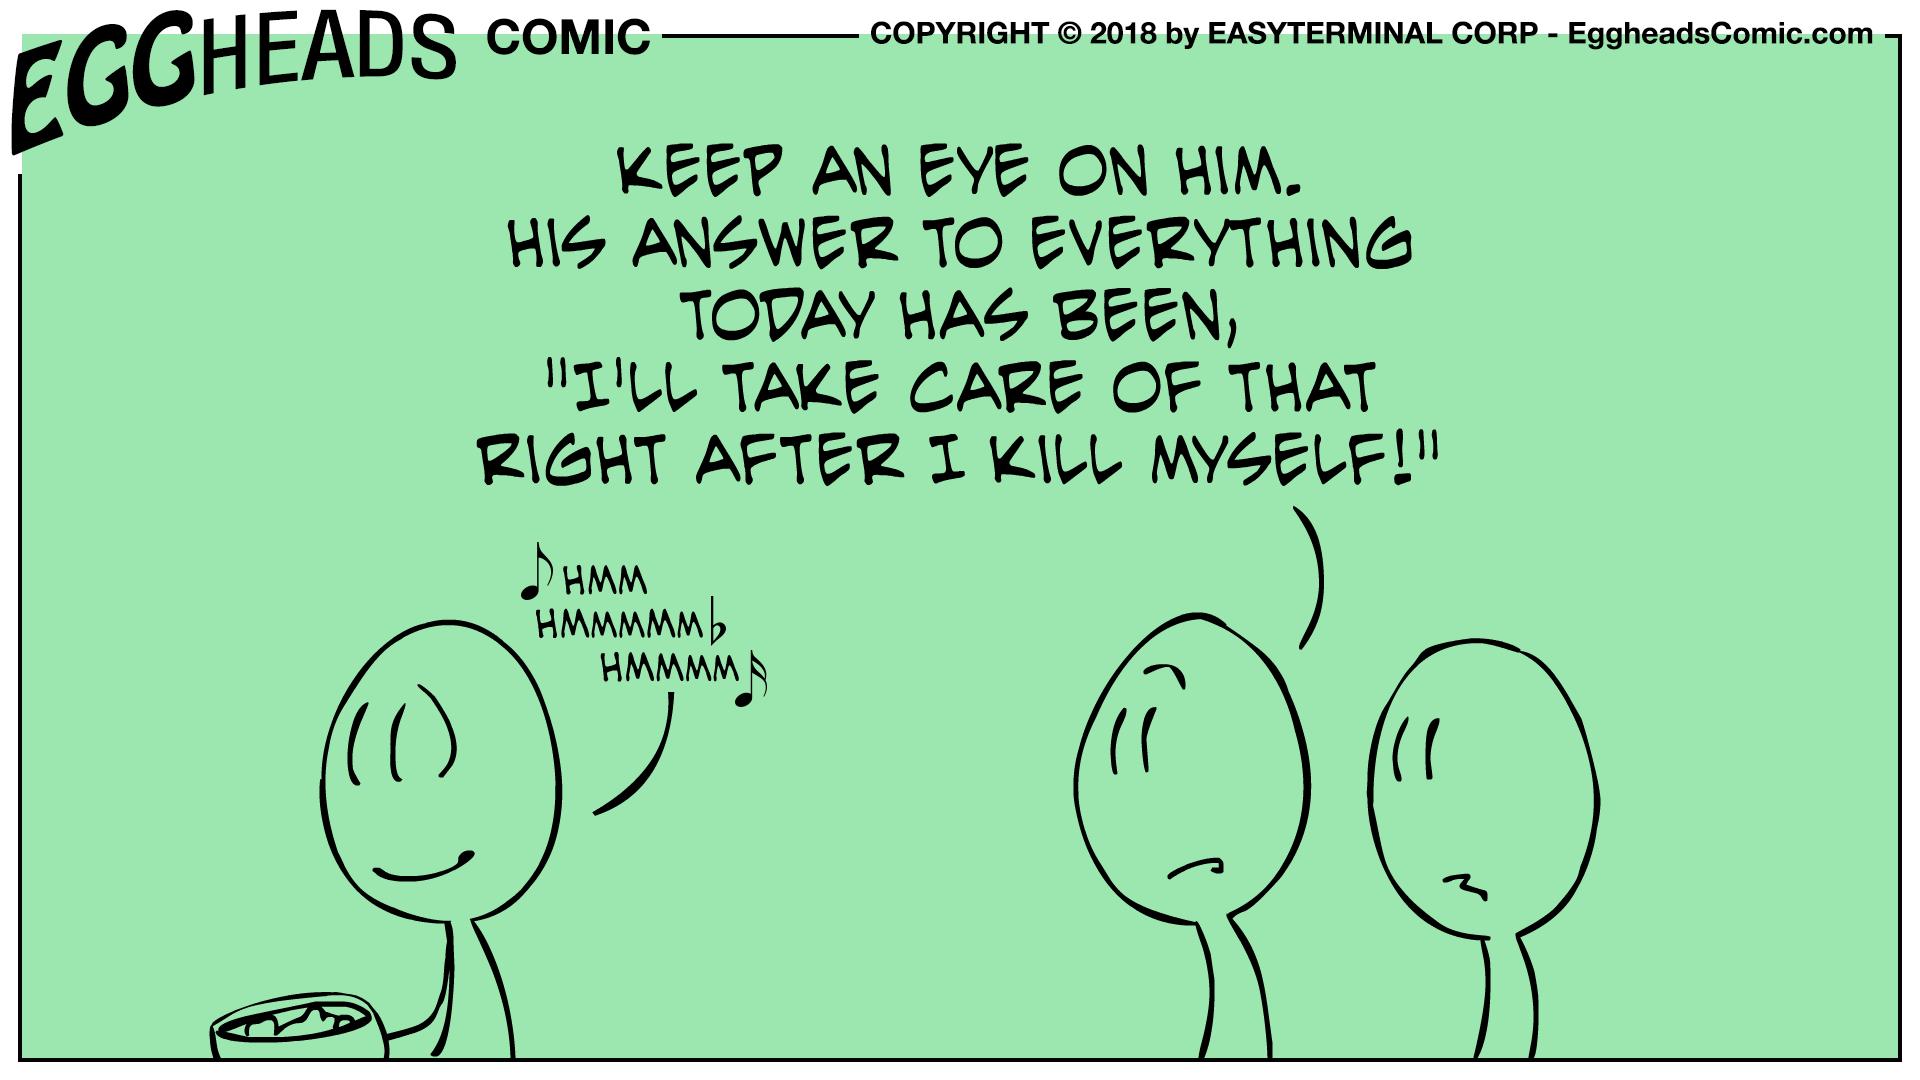 Webcomic Eggheads Comic Strip 082 Keep An Eye On Him